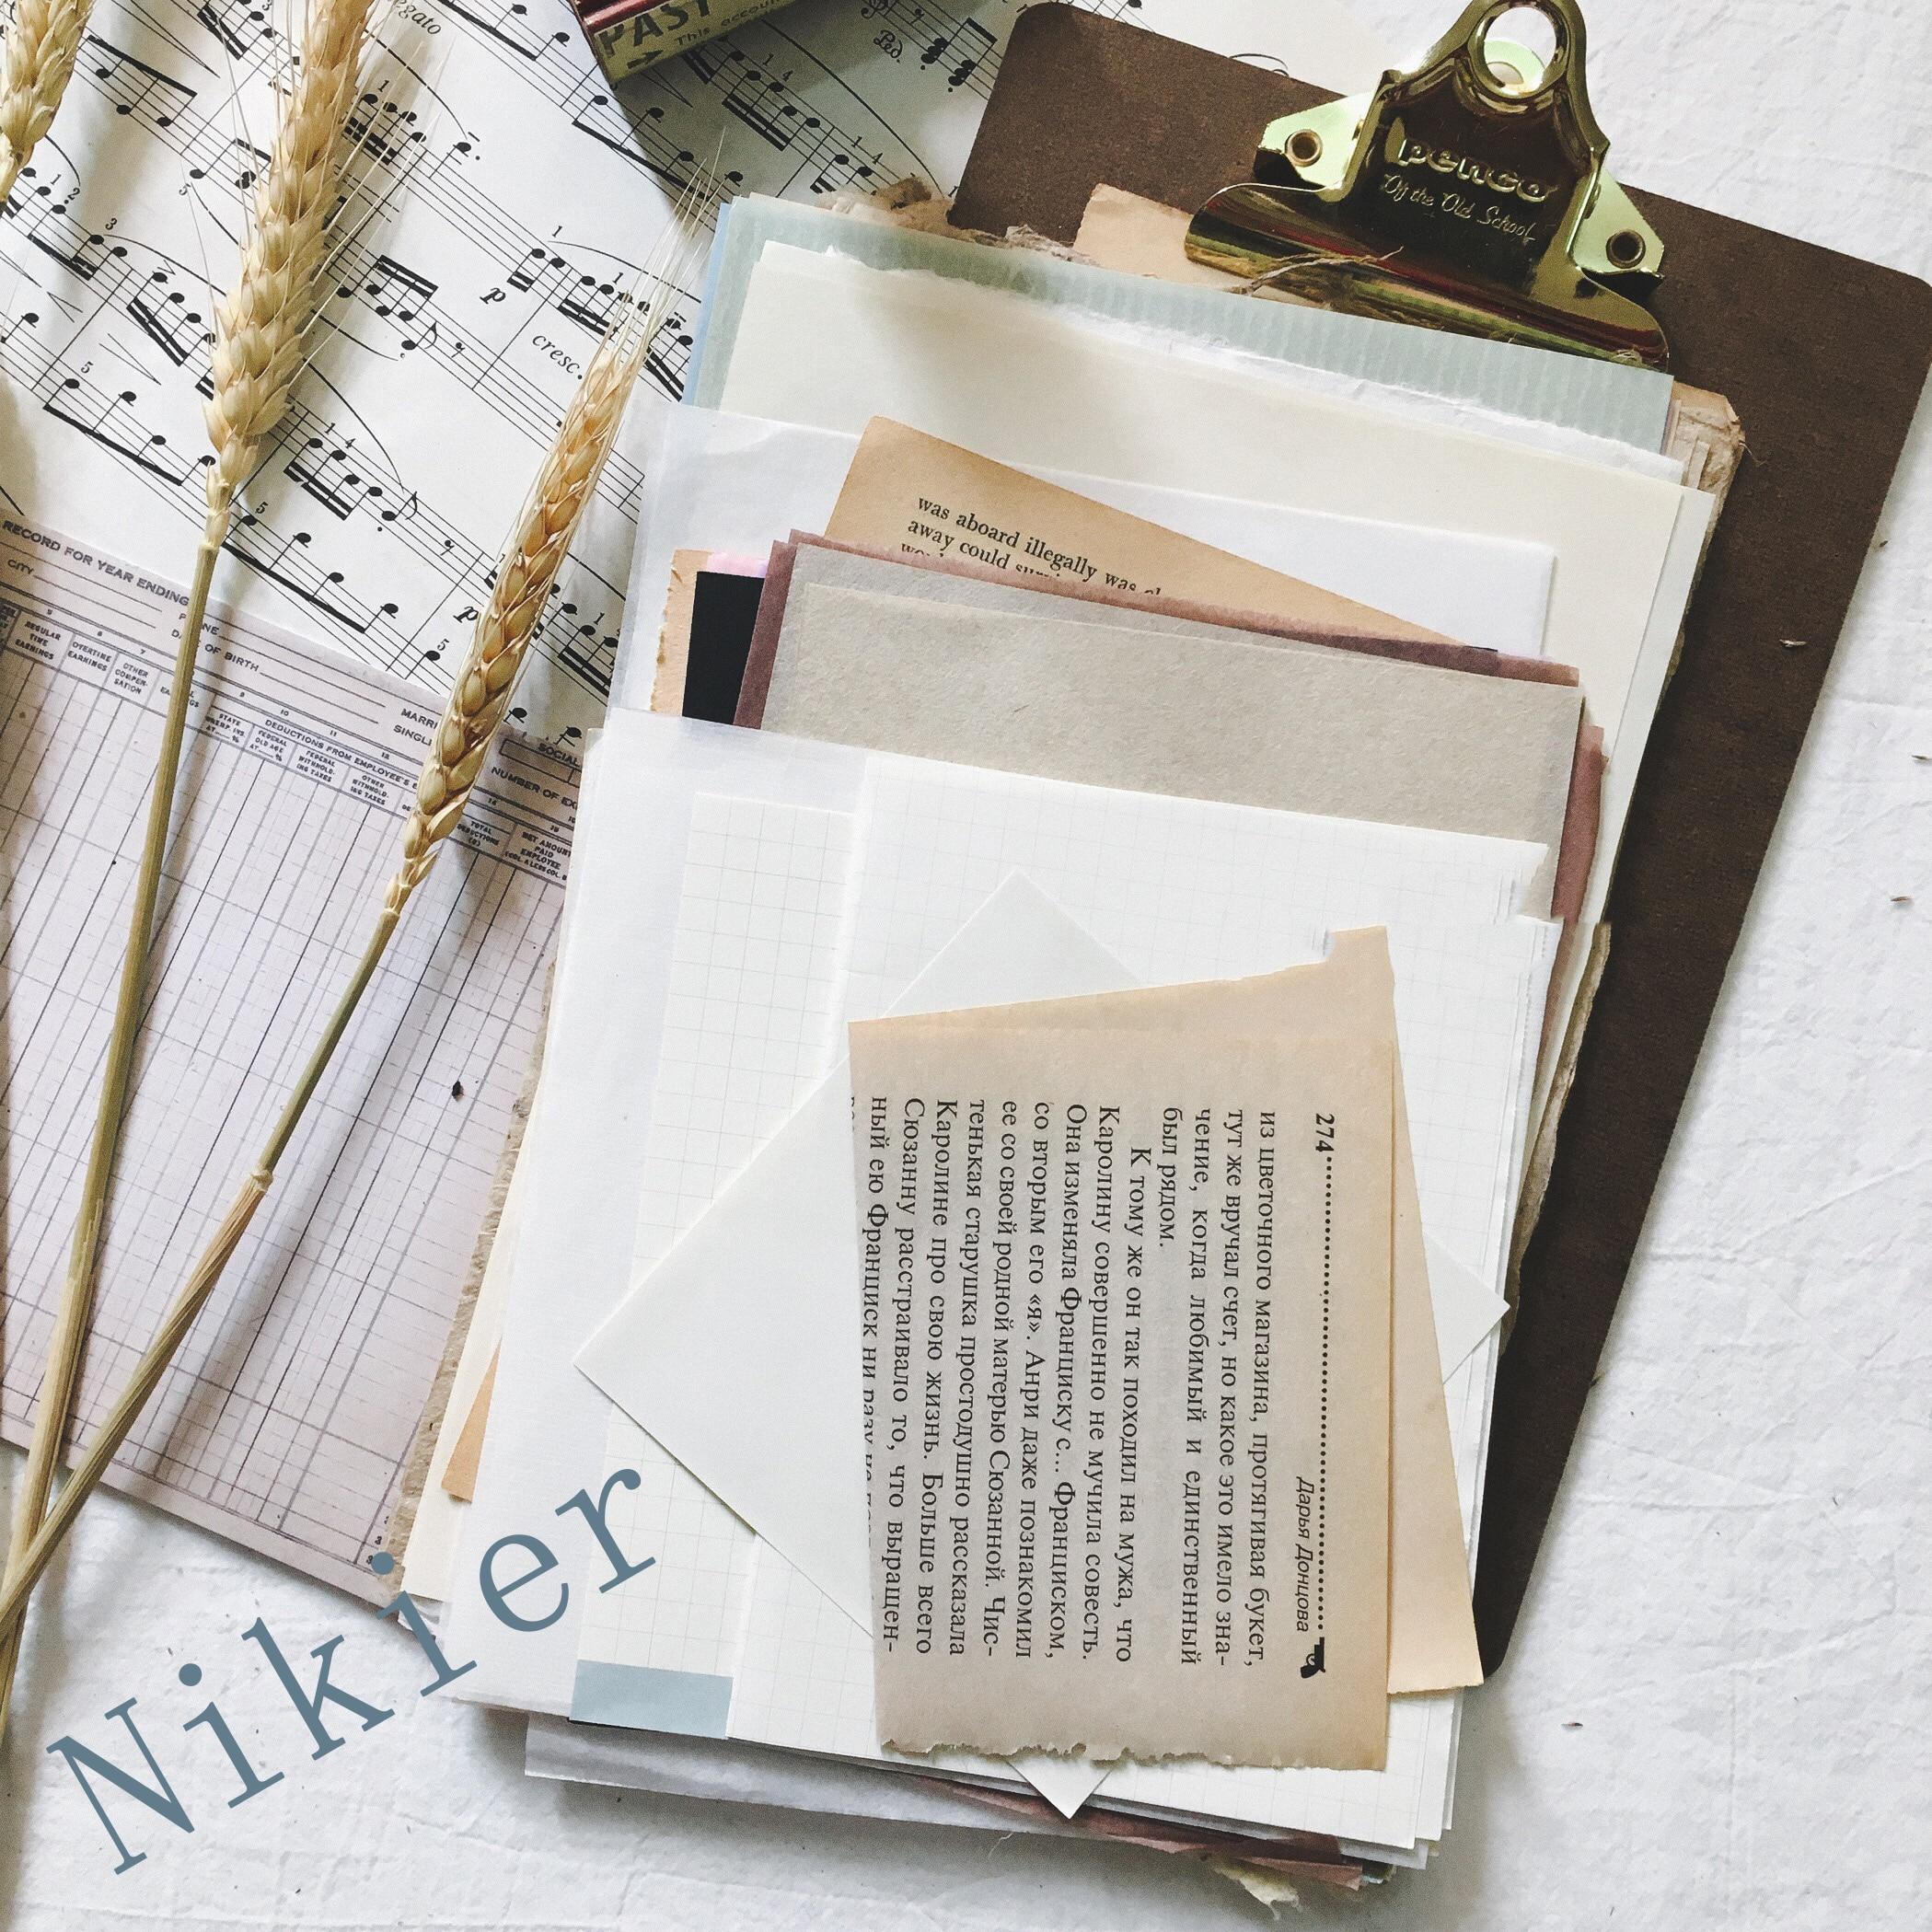 56 Sheets\package Vintage English Book\Old Textbook Retro Handwritten Plaid\Acid\Kraft Paper Material DIY Card Making/Journaling